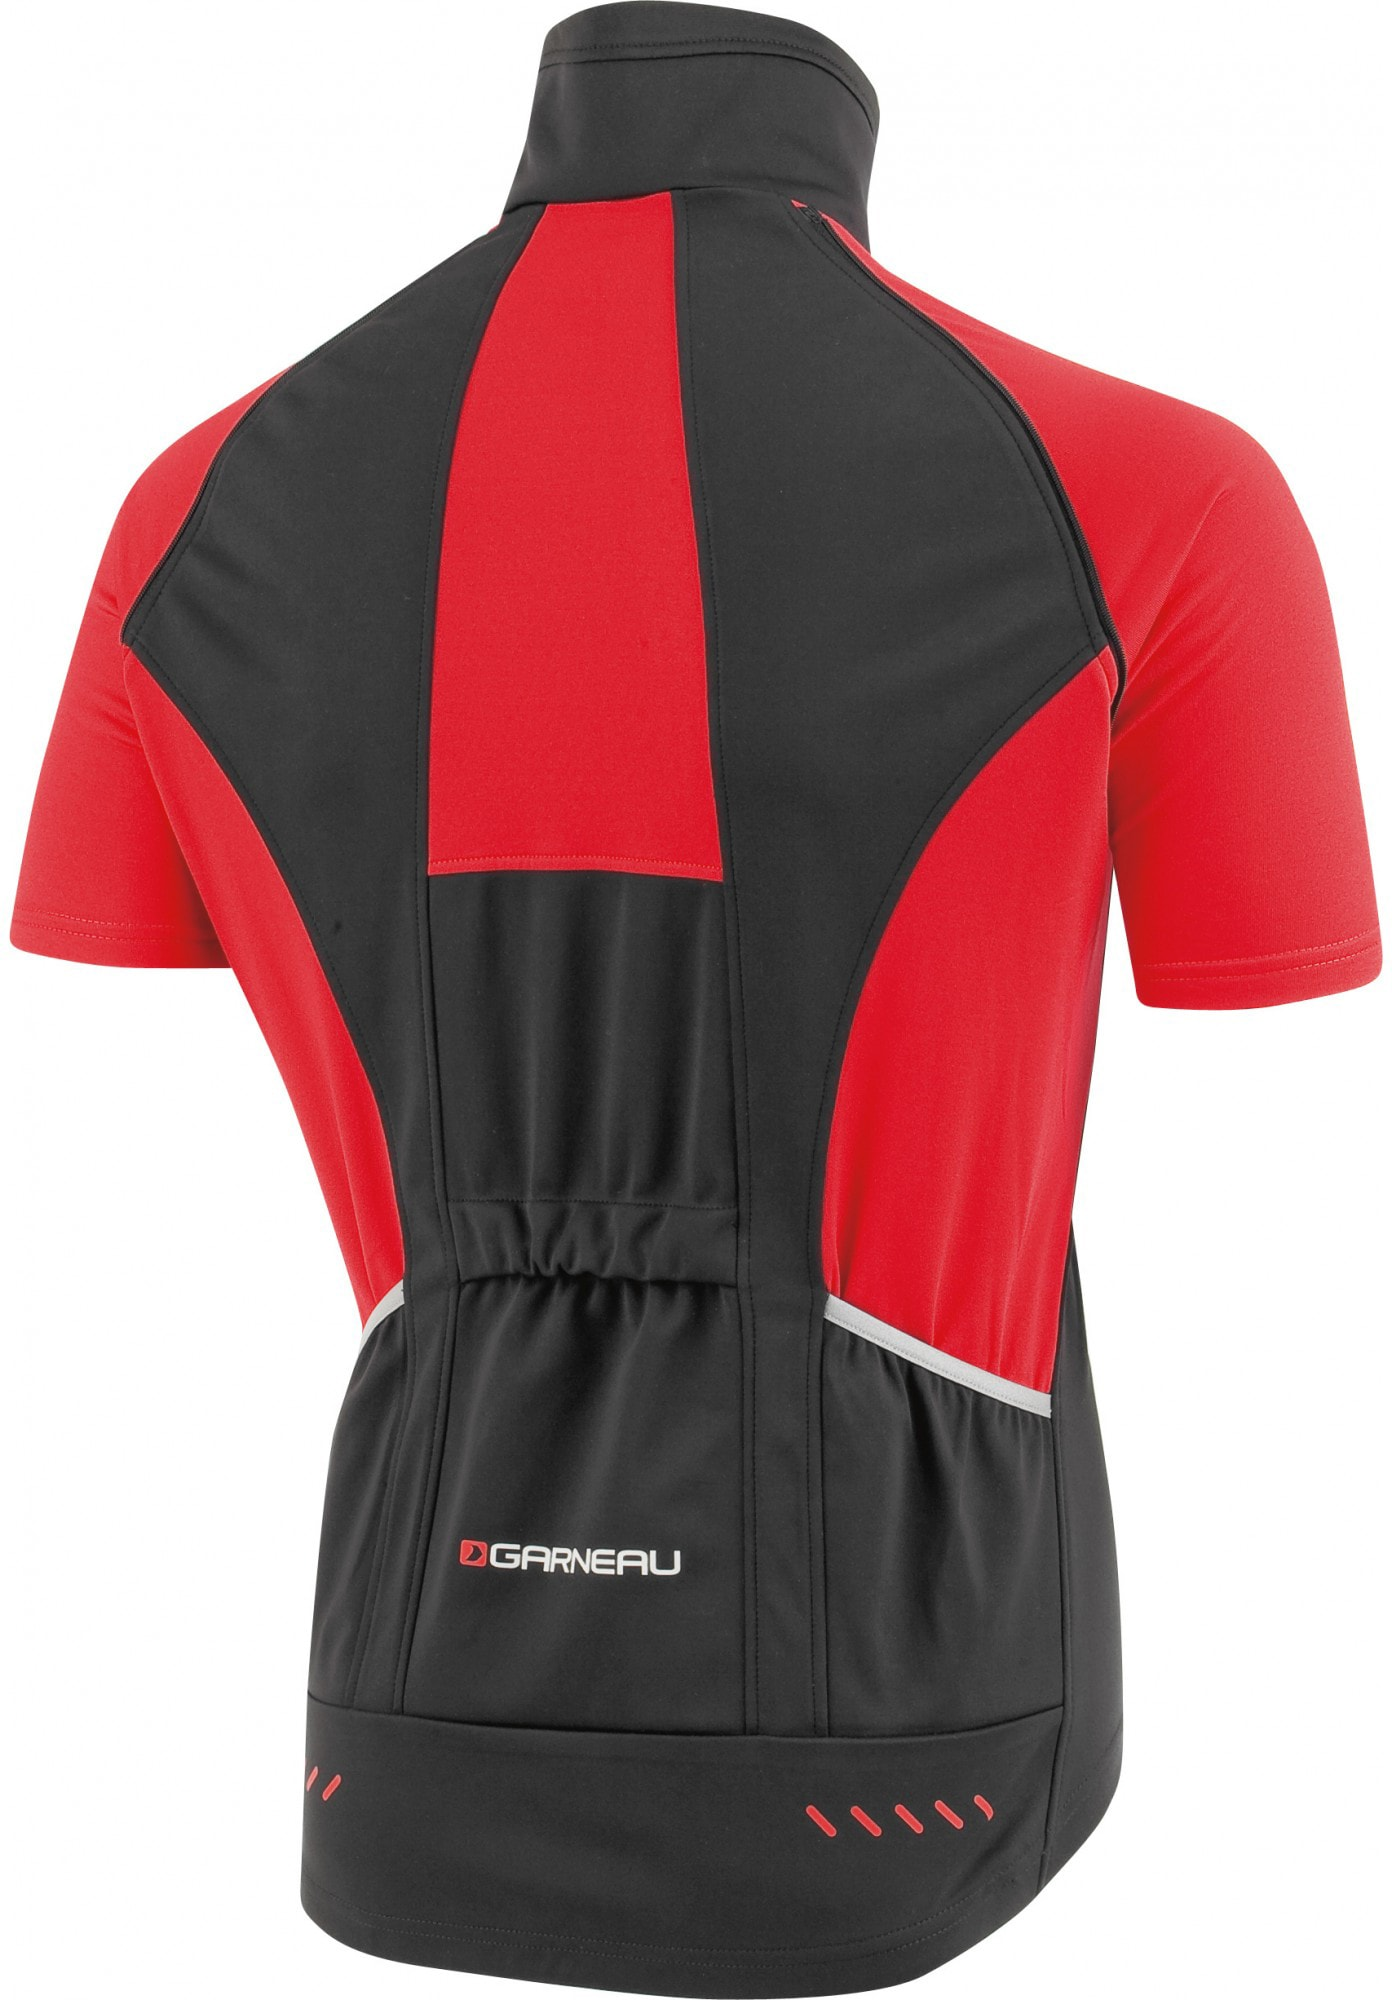 Louis Garneau Spire Convertible Bike Jacket - thumbnail 4 330e525ca